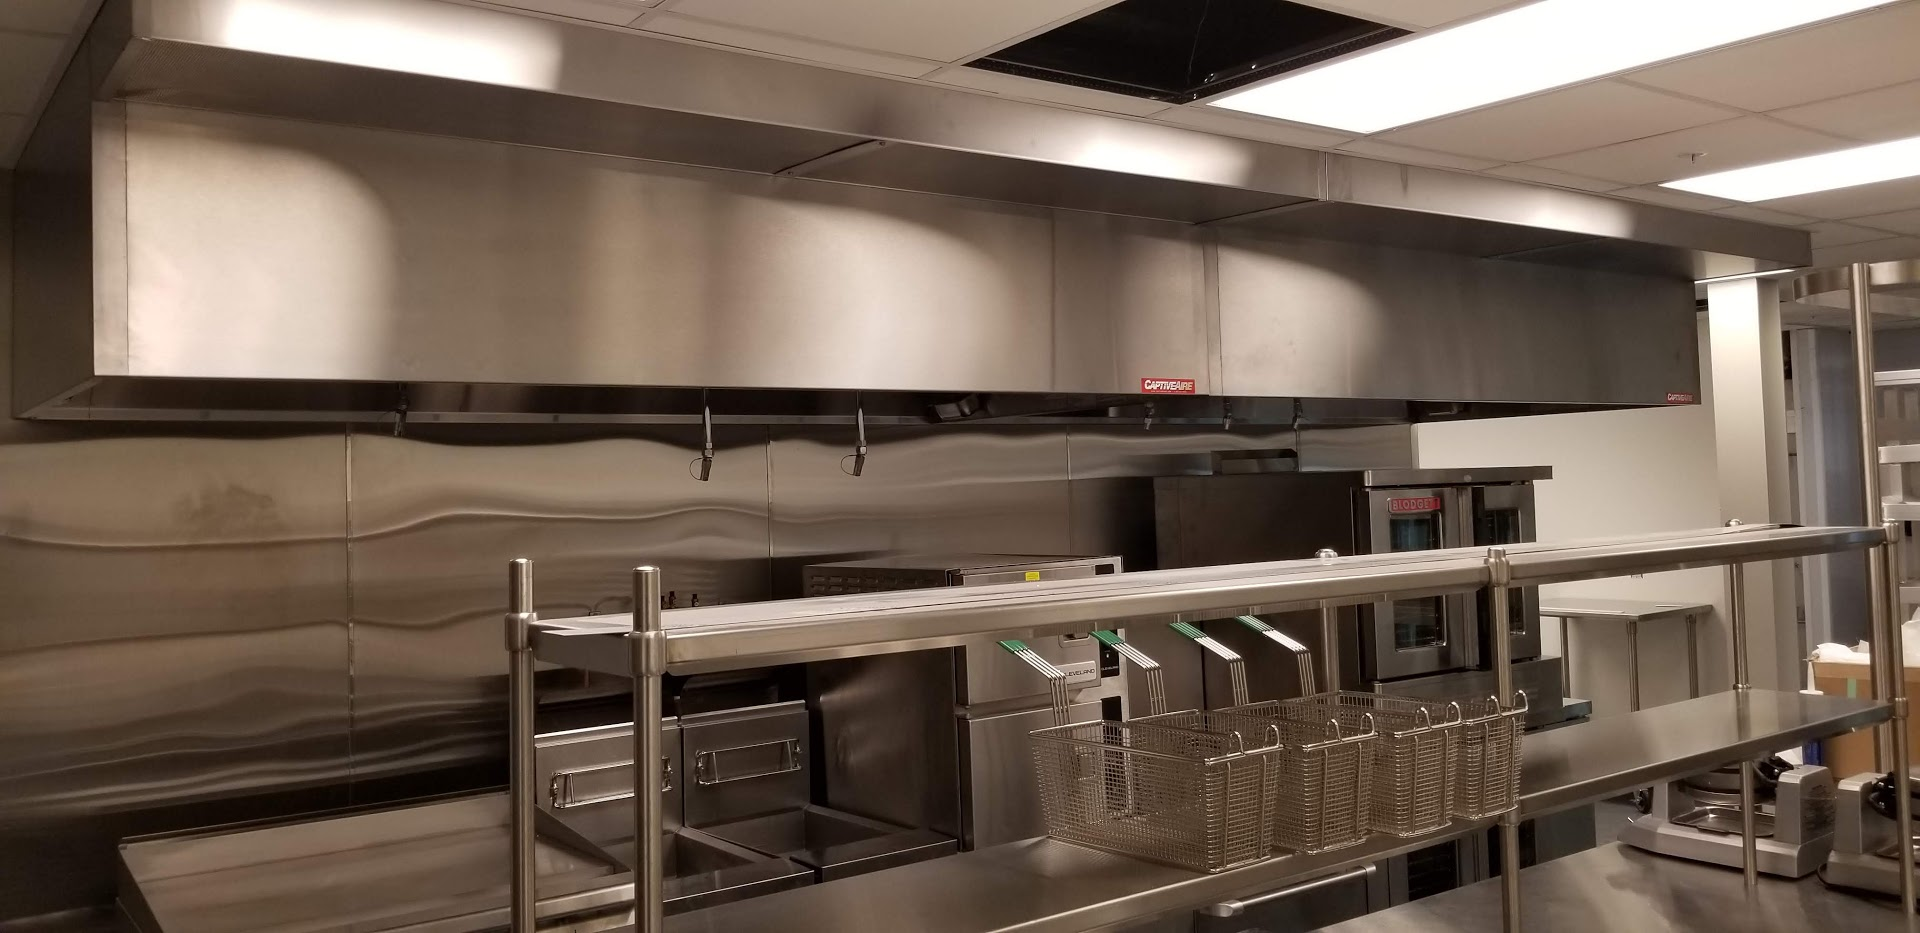 highlander food hall in north omaha Kitchen hood installation